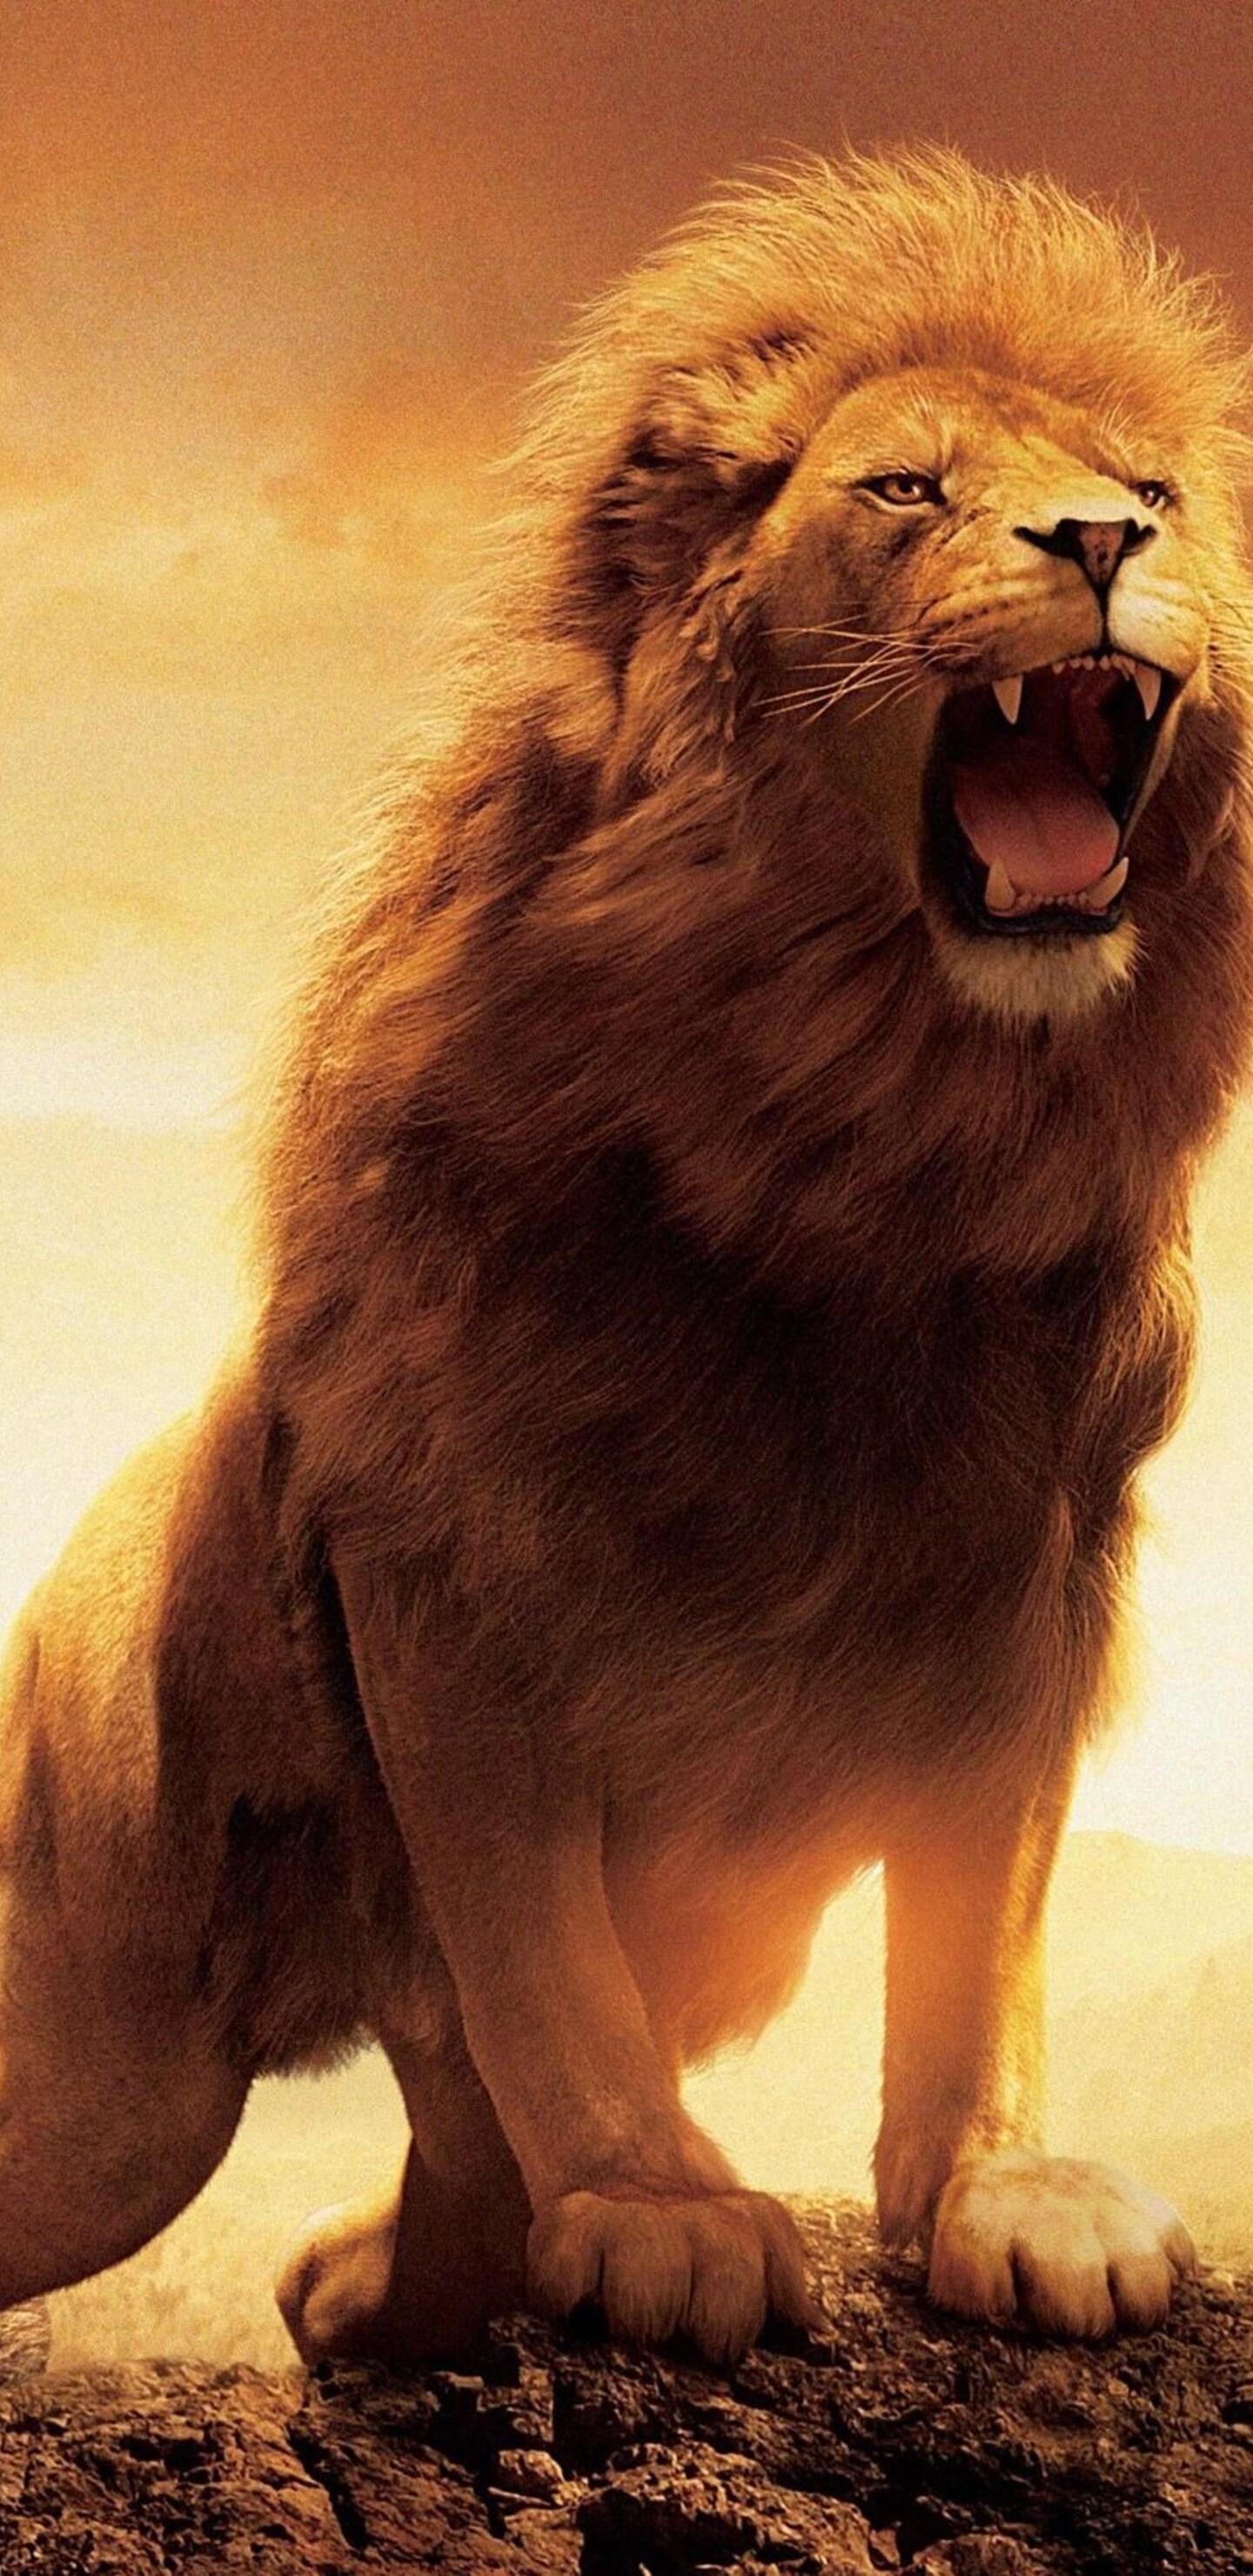 1440x2960 Narnia Lion Samsung Galaxy Note 9 8 S9 S8 S8 Qhd Hd 4k